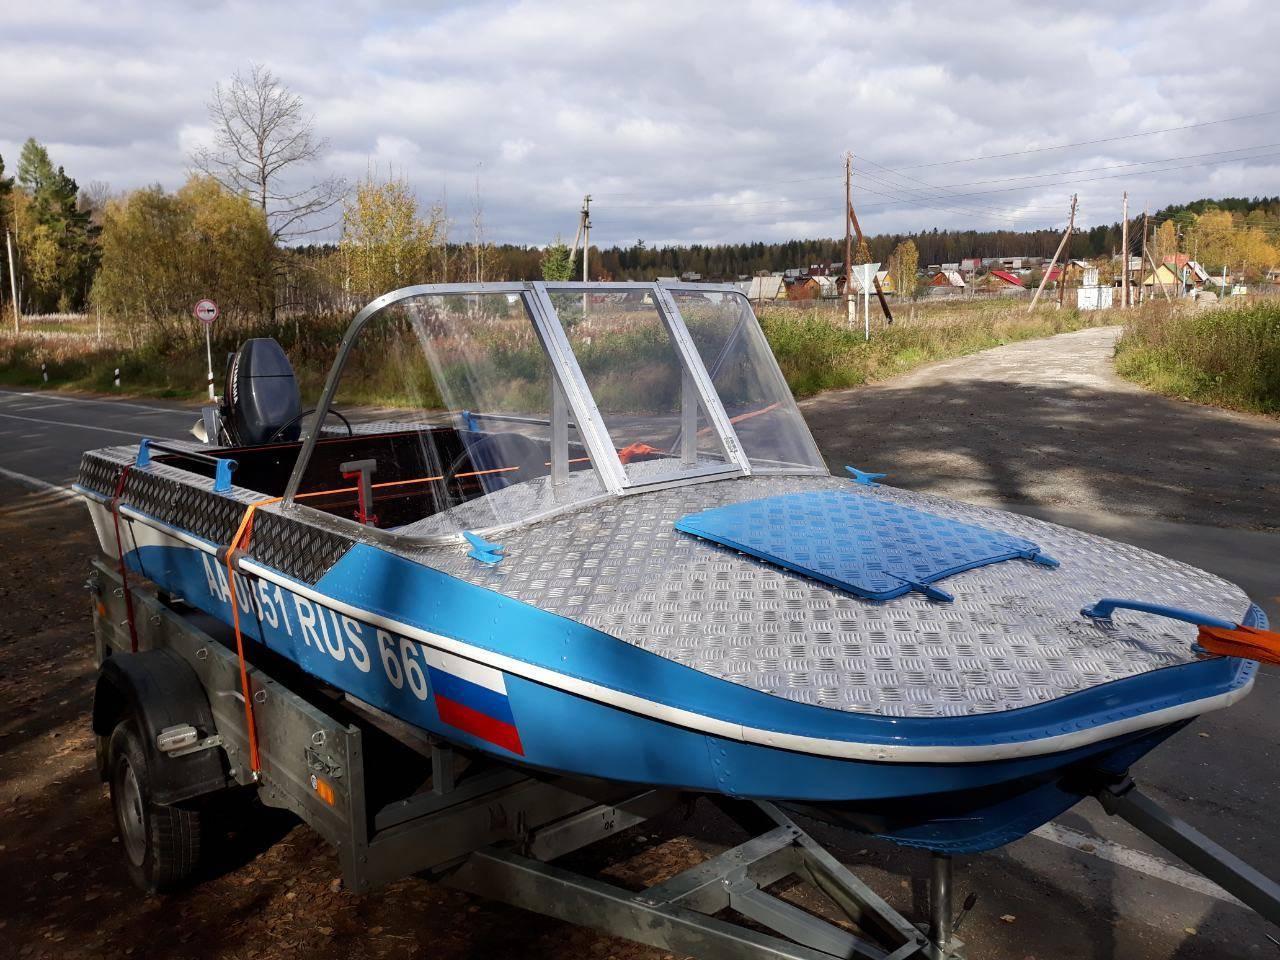 Лодка обь 1, 2, 3. 4 , 5, м: технические характеристики, цена, отзывы